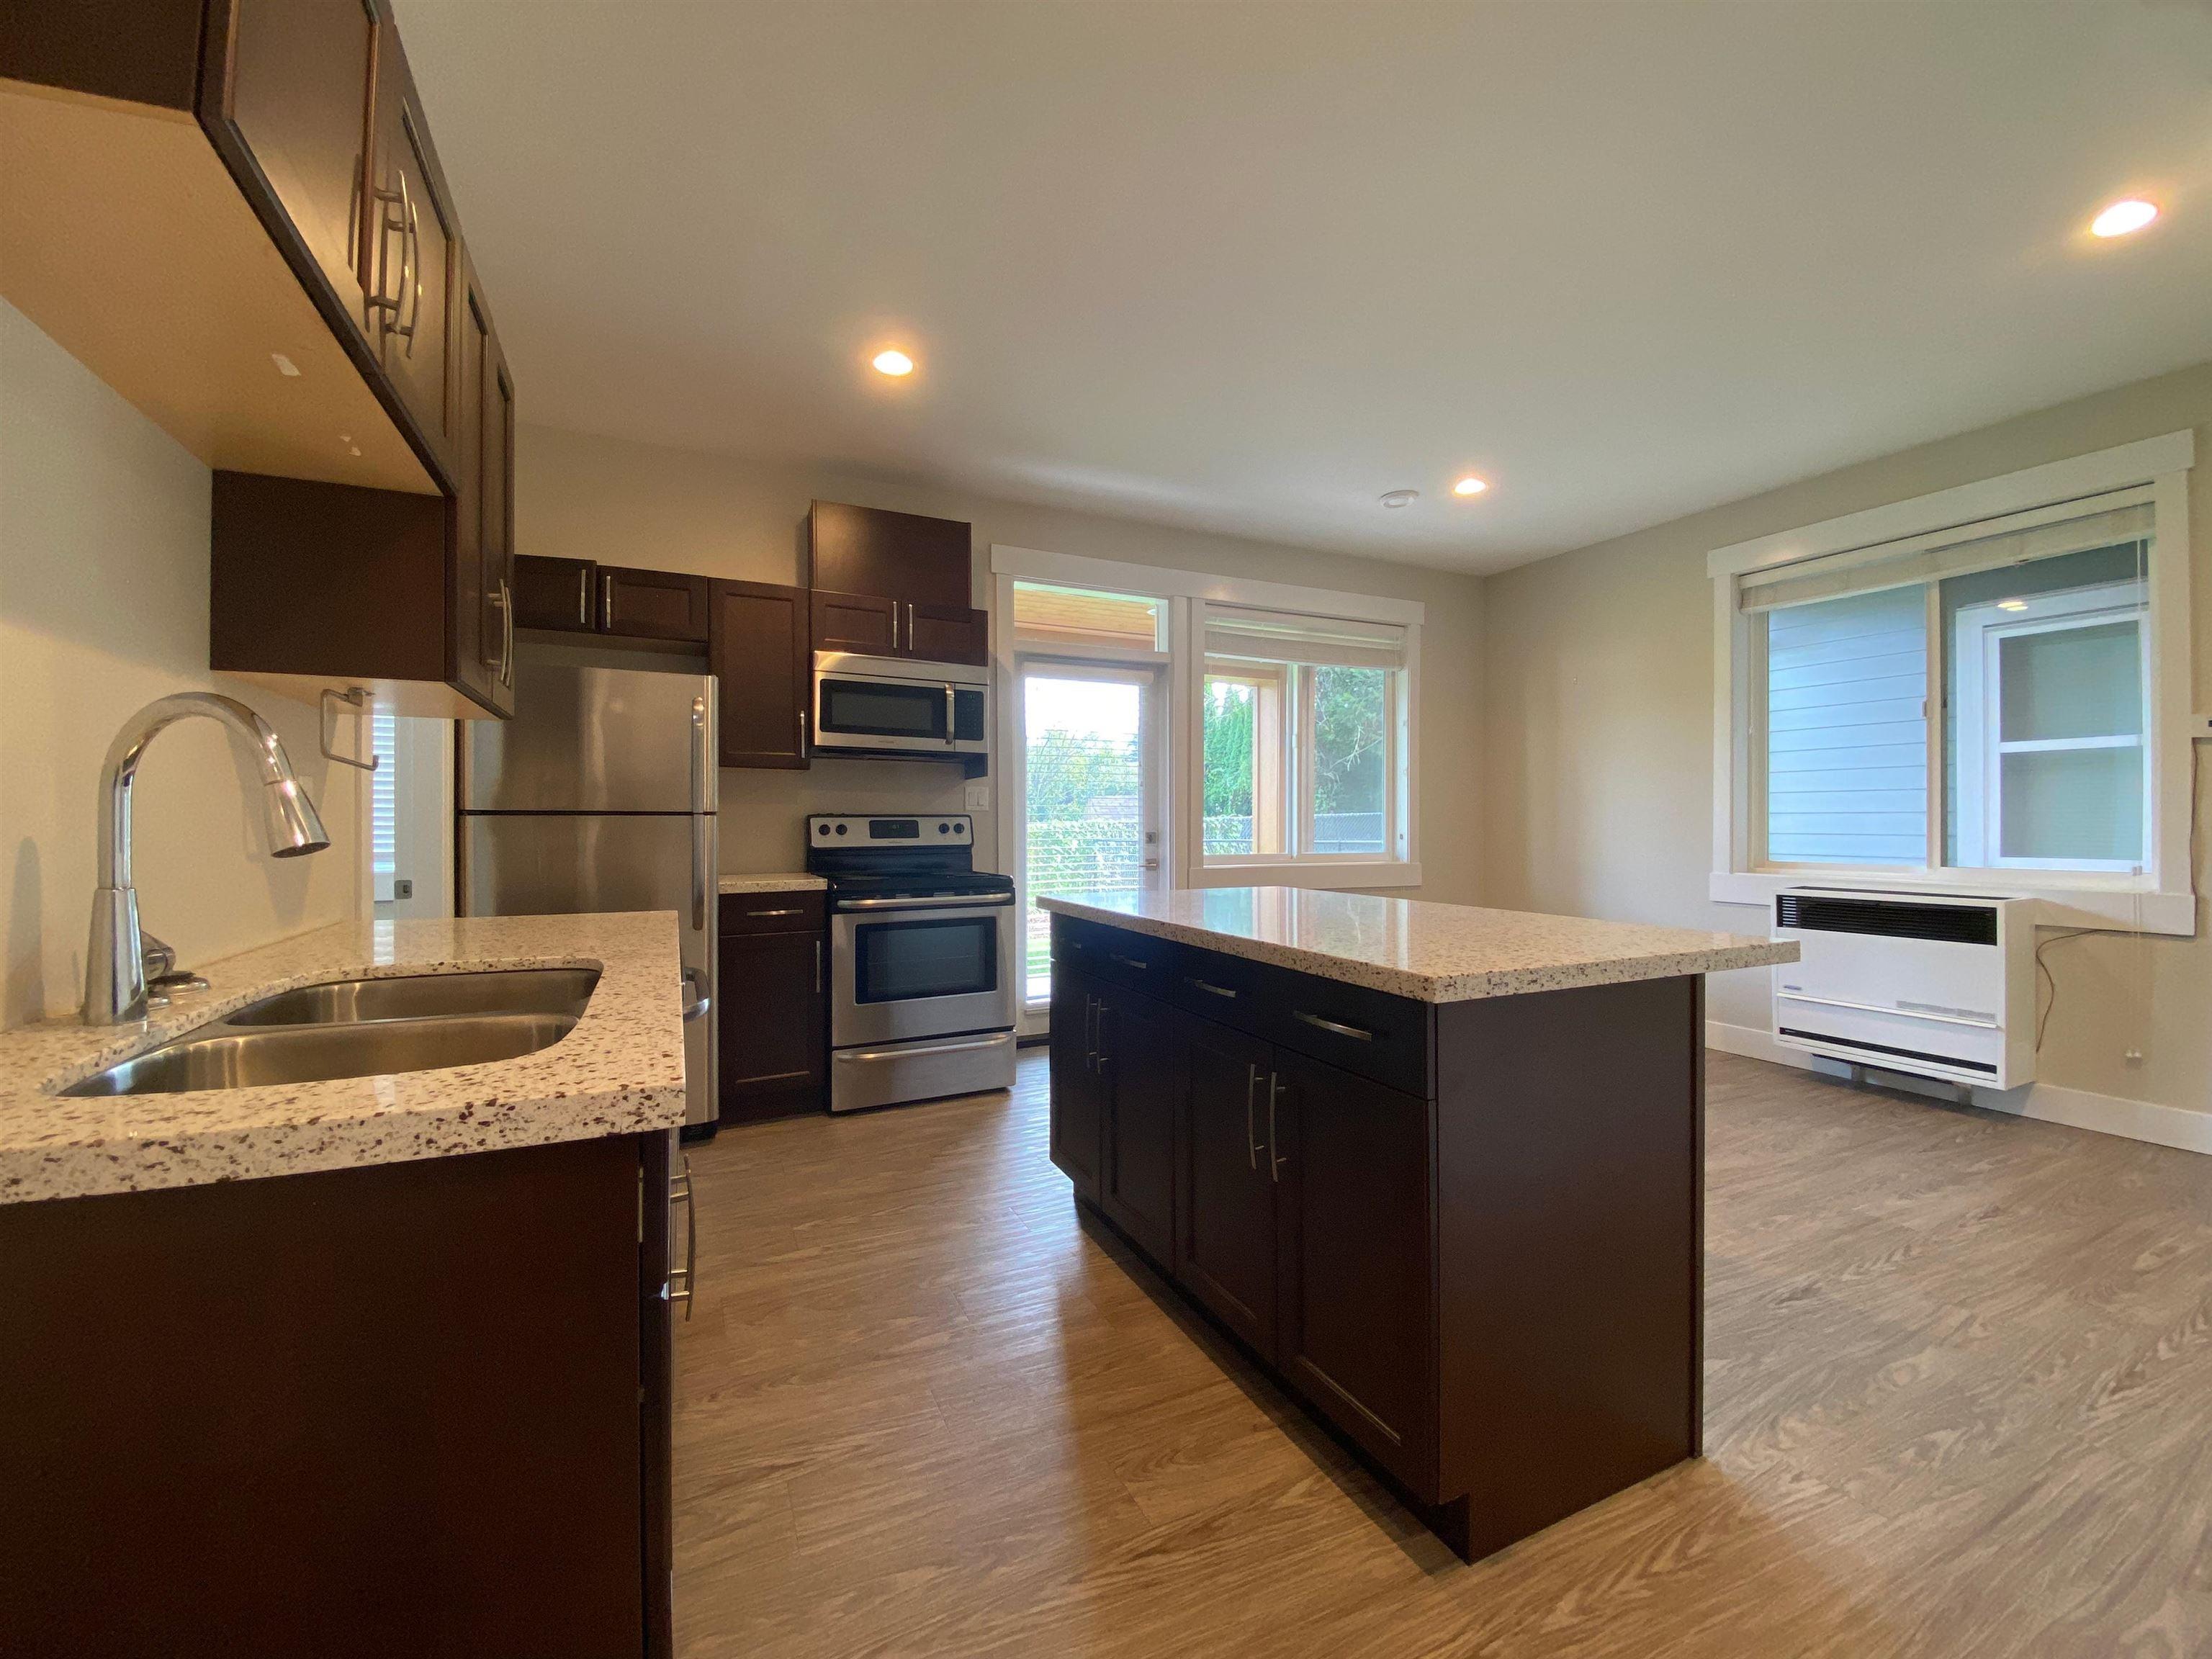 10144 KILLARNEY DRIVE - Fairfield Island House/Single Family for sale, 5 Bedrooms (R2625716) - #32